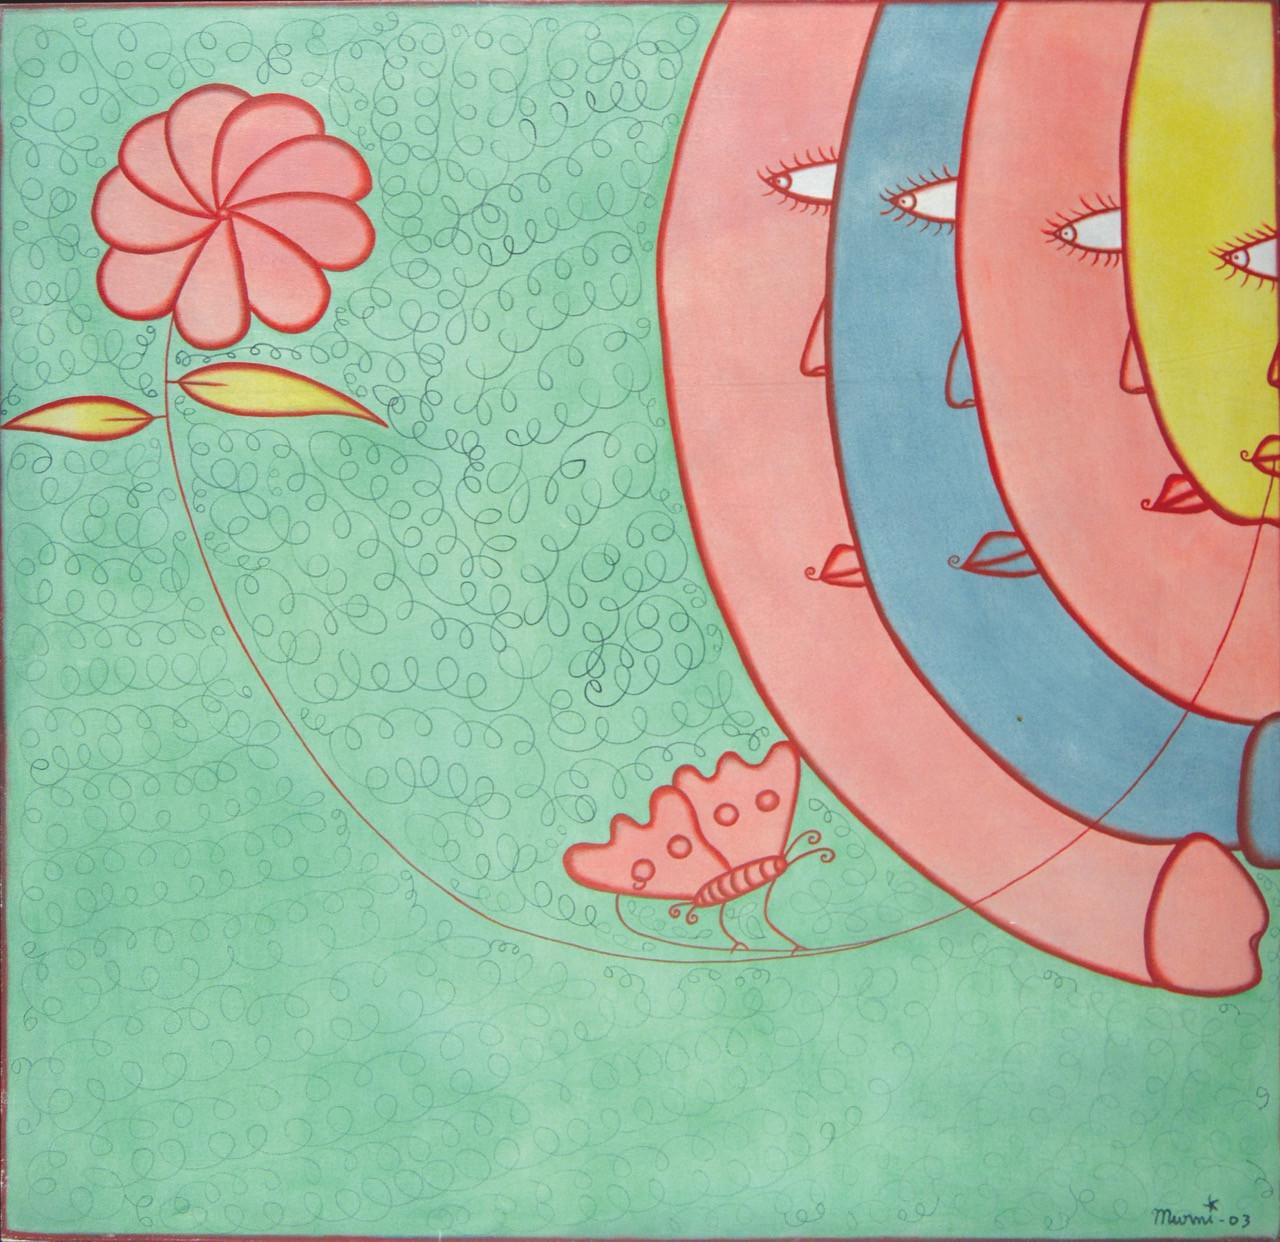 Lot 769: I Gusti Ayu Kadek Murniasih, 'Musim Semi', 2003, acrylic on canvas, 100 by 100 cm.